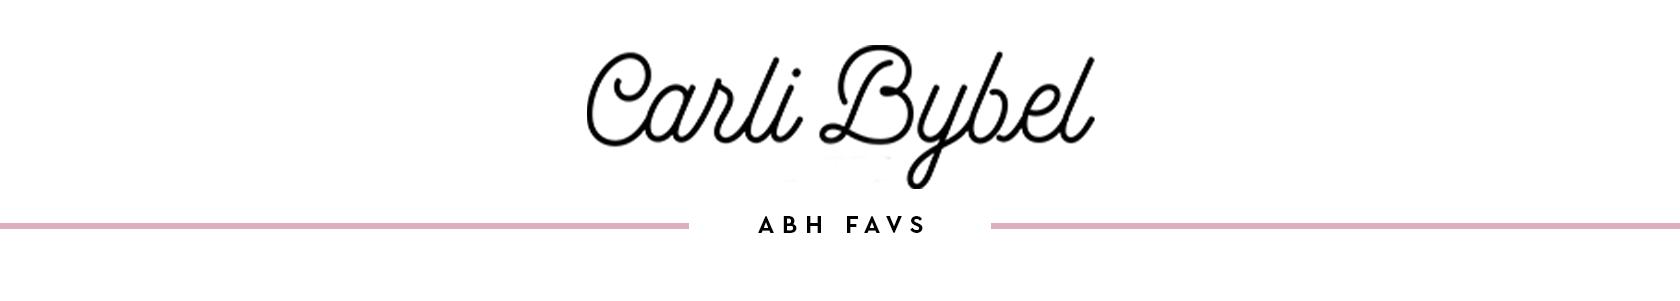 carli-bybel-abh-favs